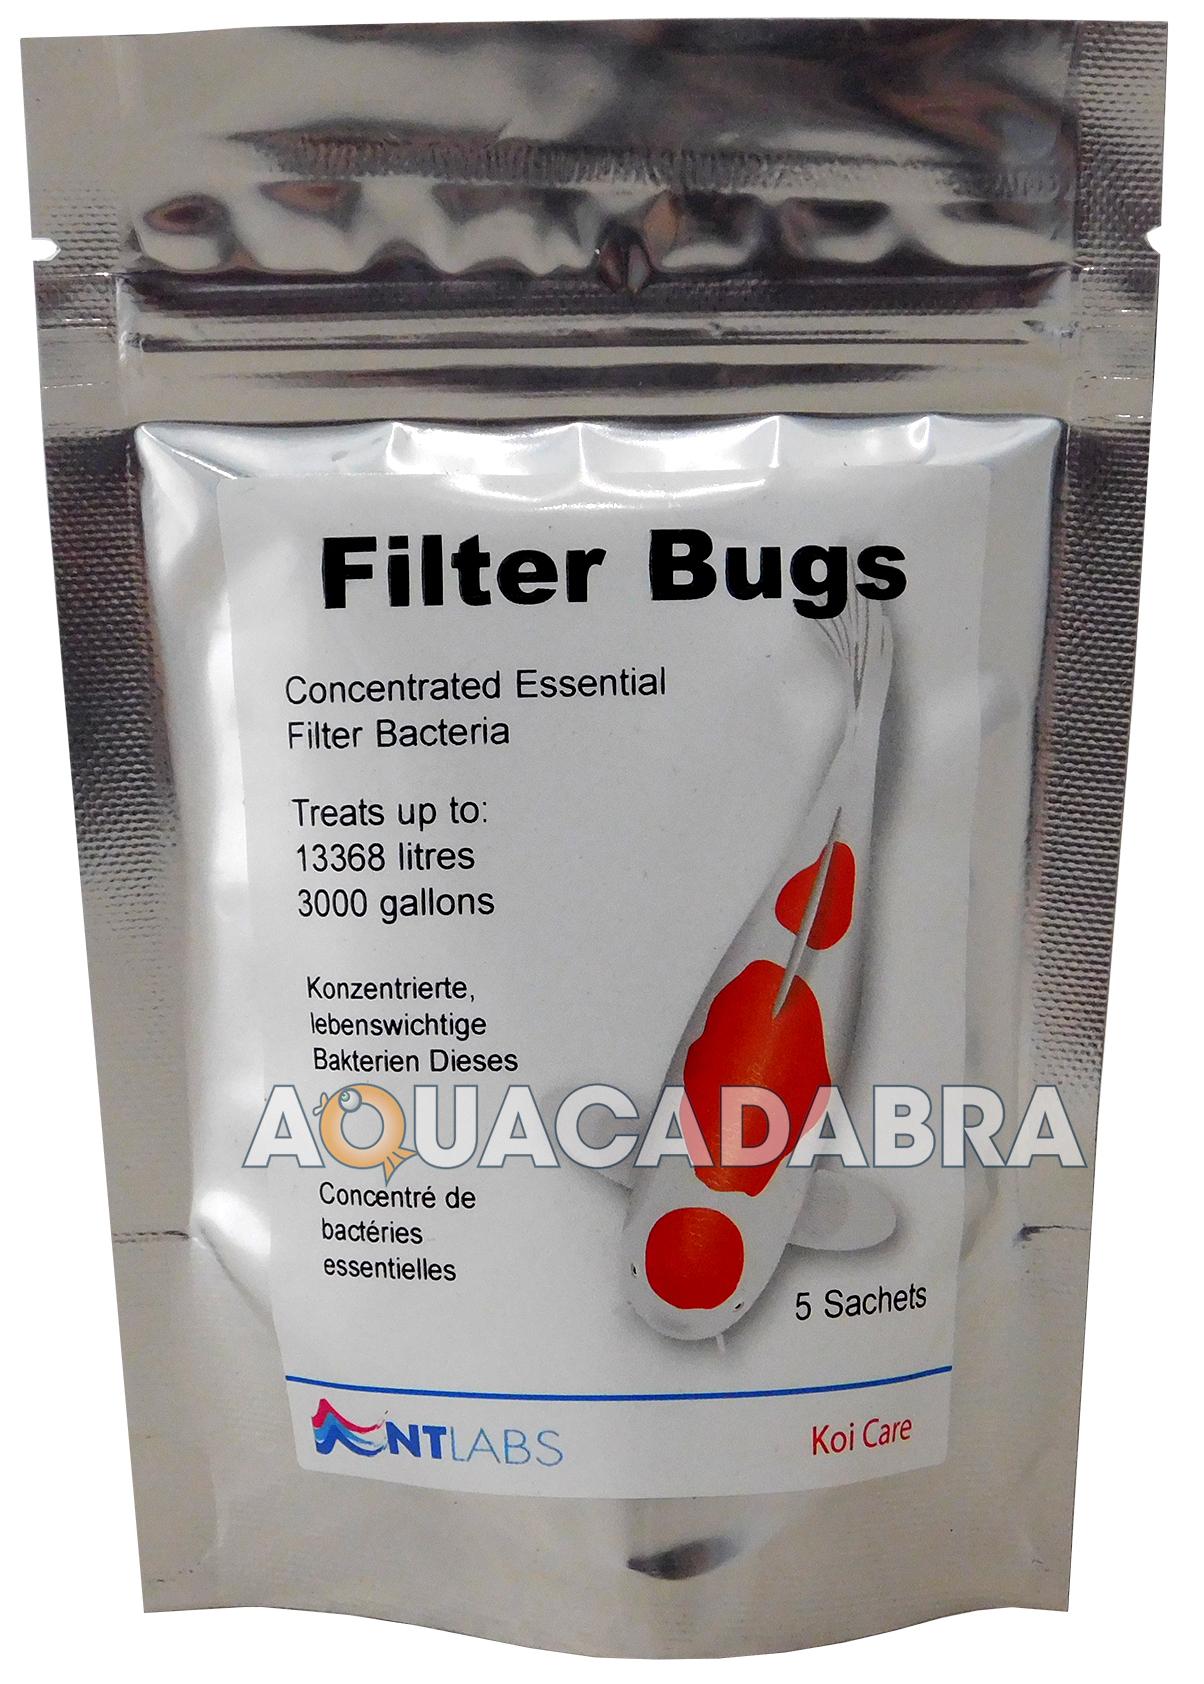 Nt labs filter bugs 5 sponge pads start koi fish ponds for Fish pond filter sponges